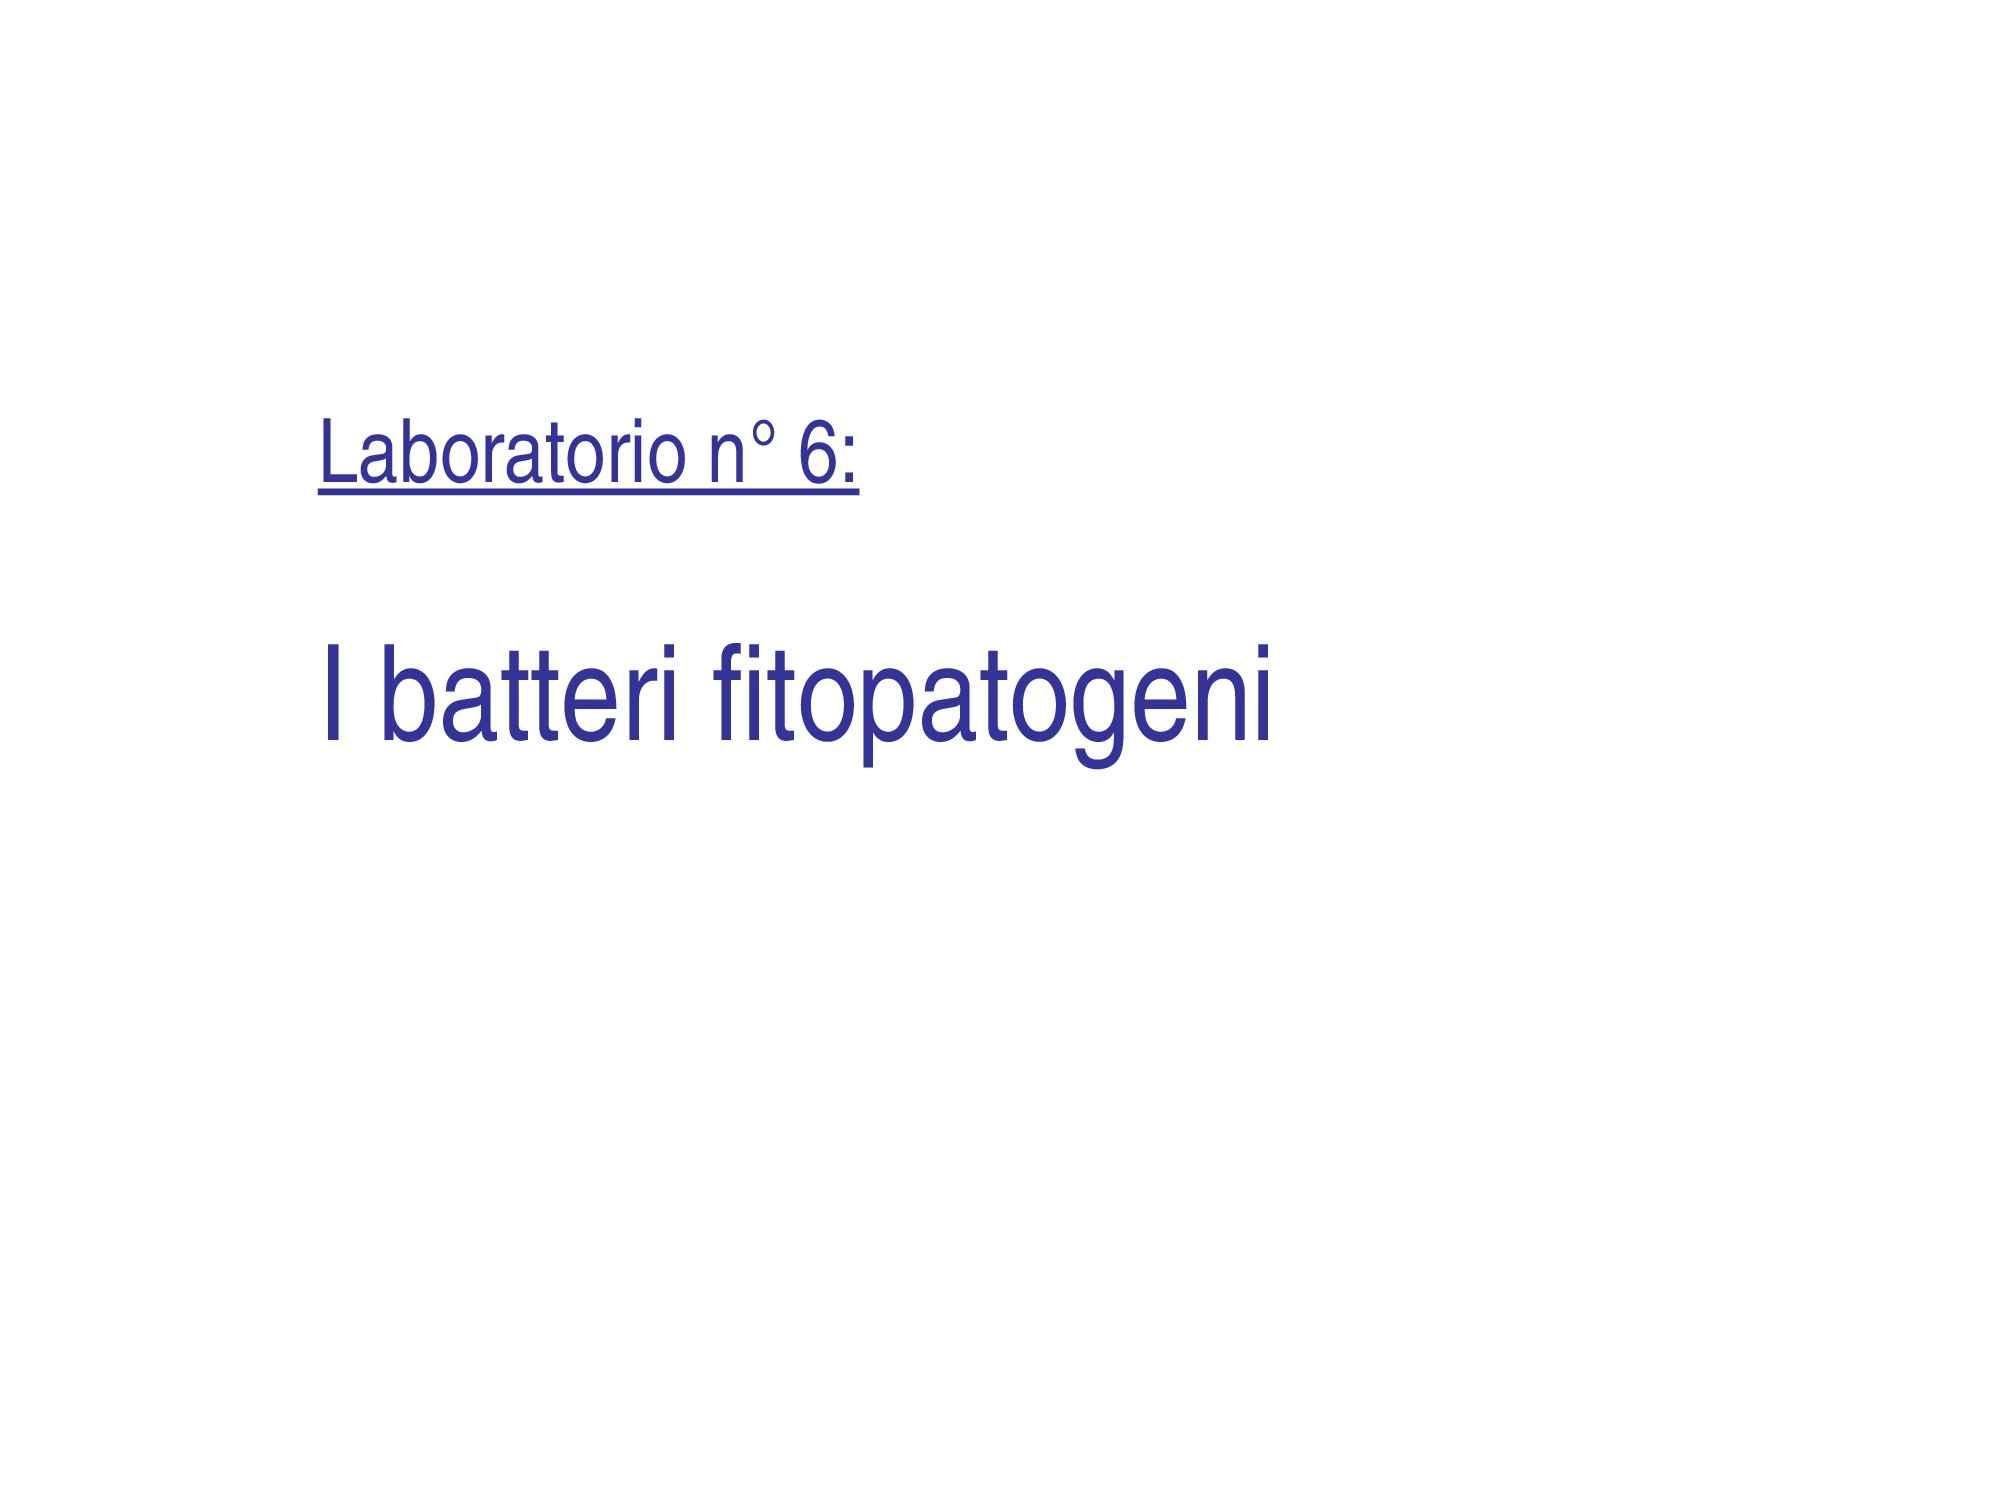 Batteri fitopatogeni